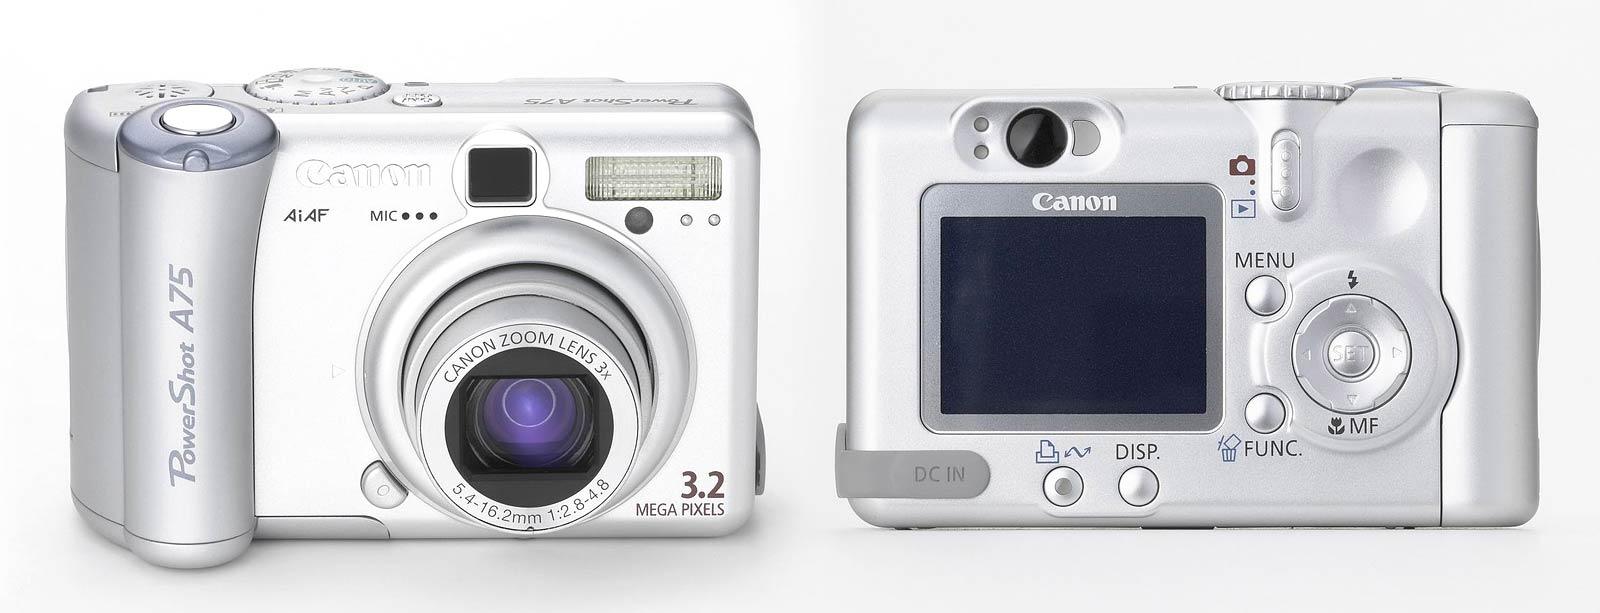 Canon PowerShot A550 Camera Twain Linux